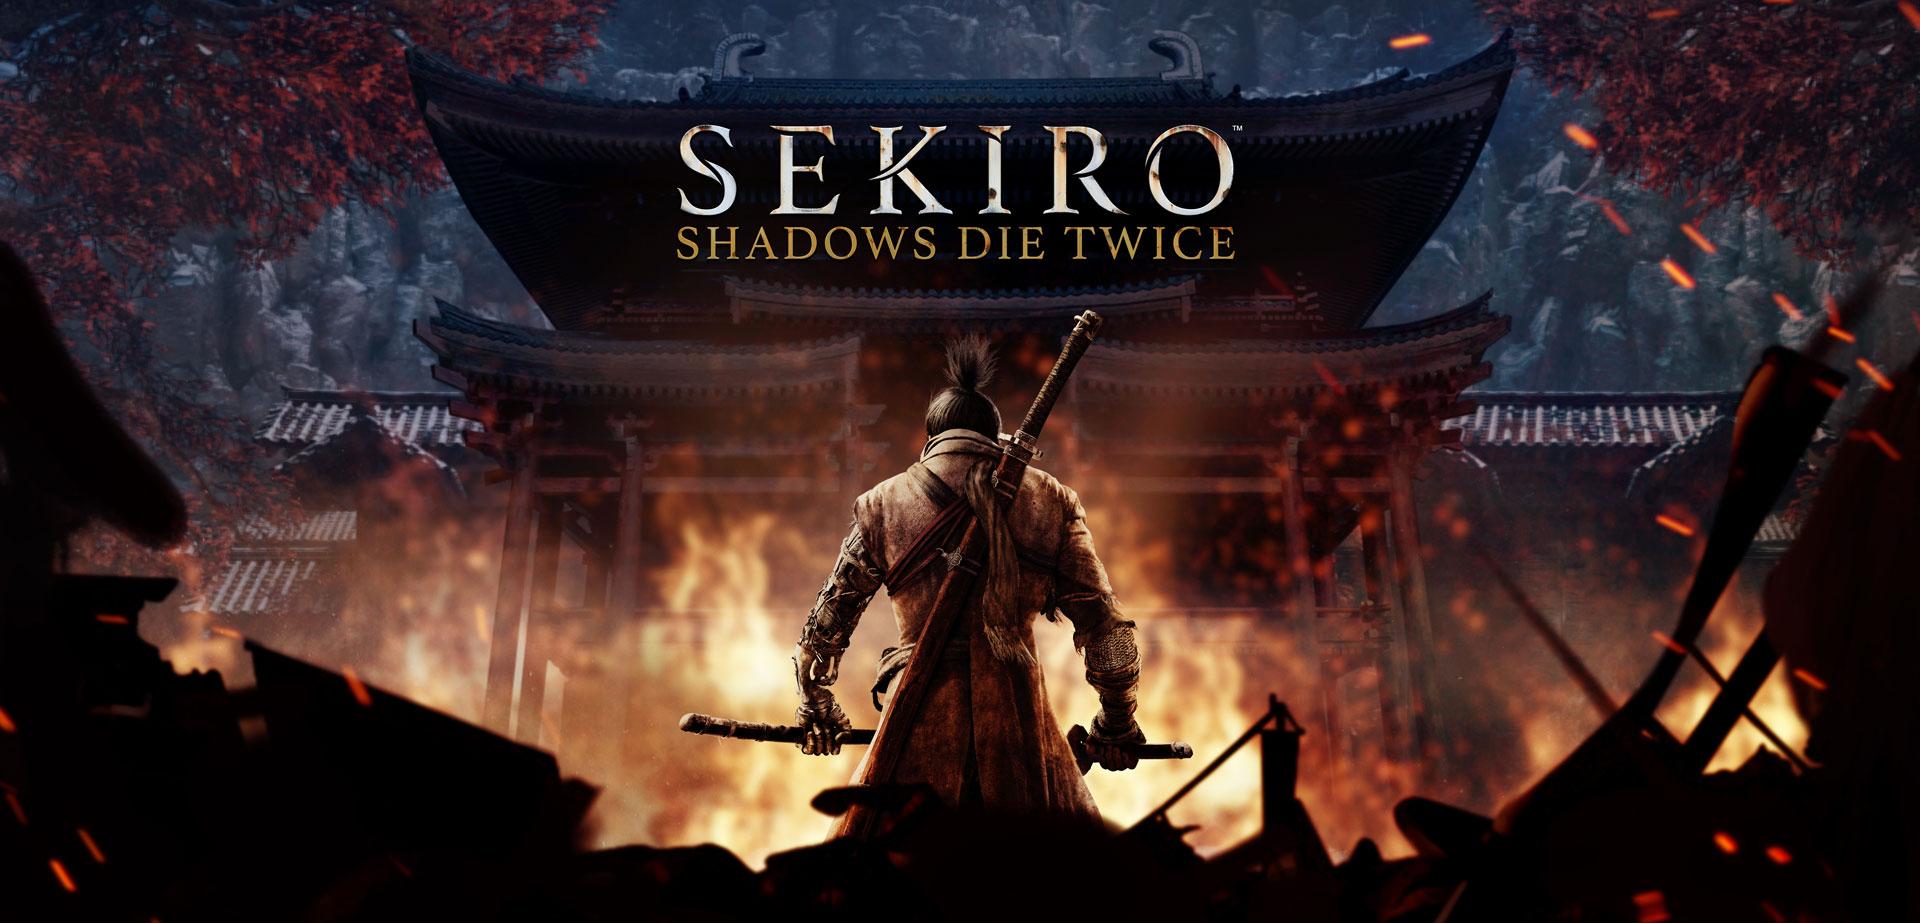 Sekiro shadows